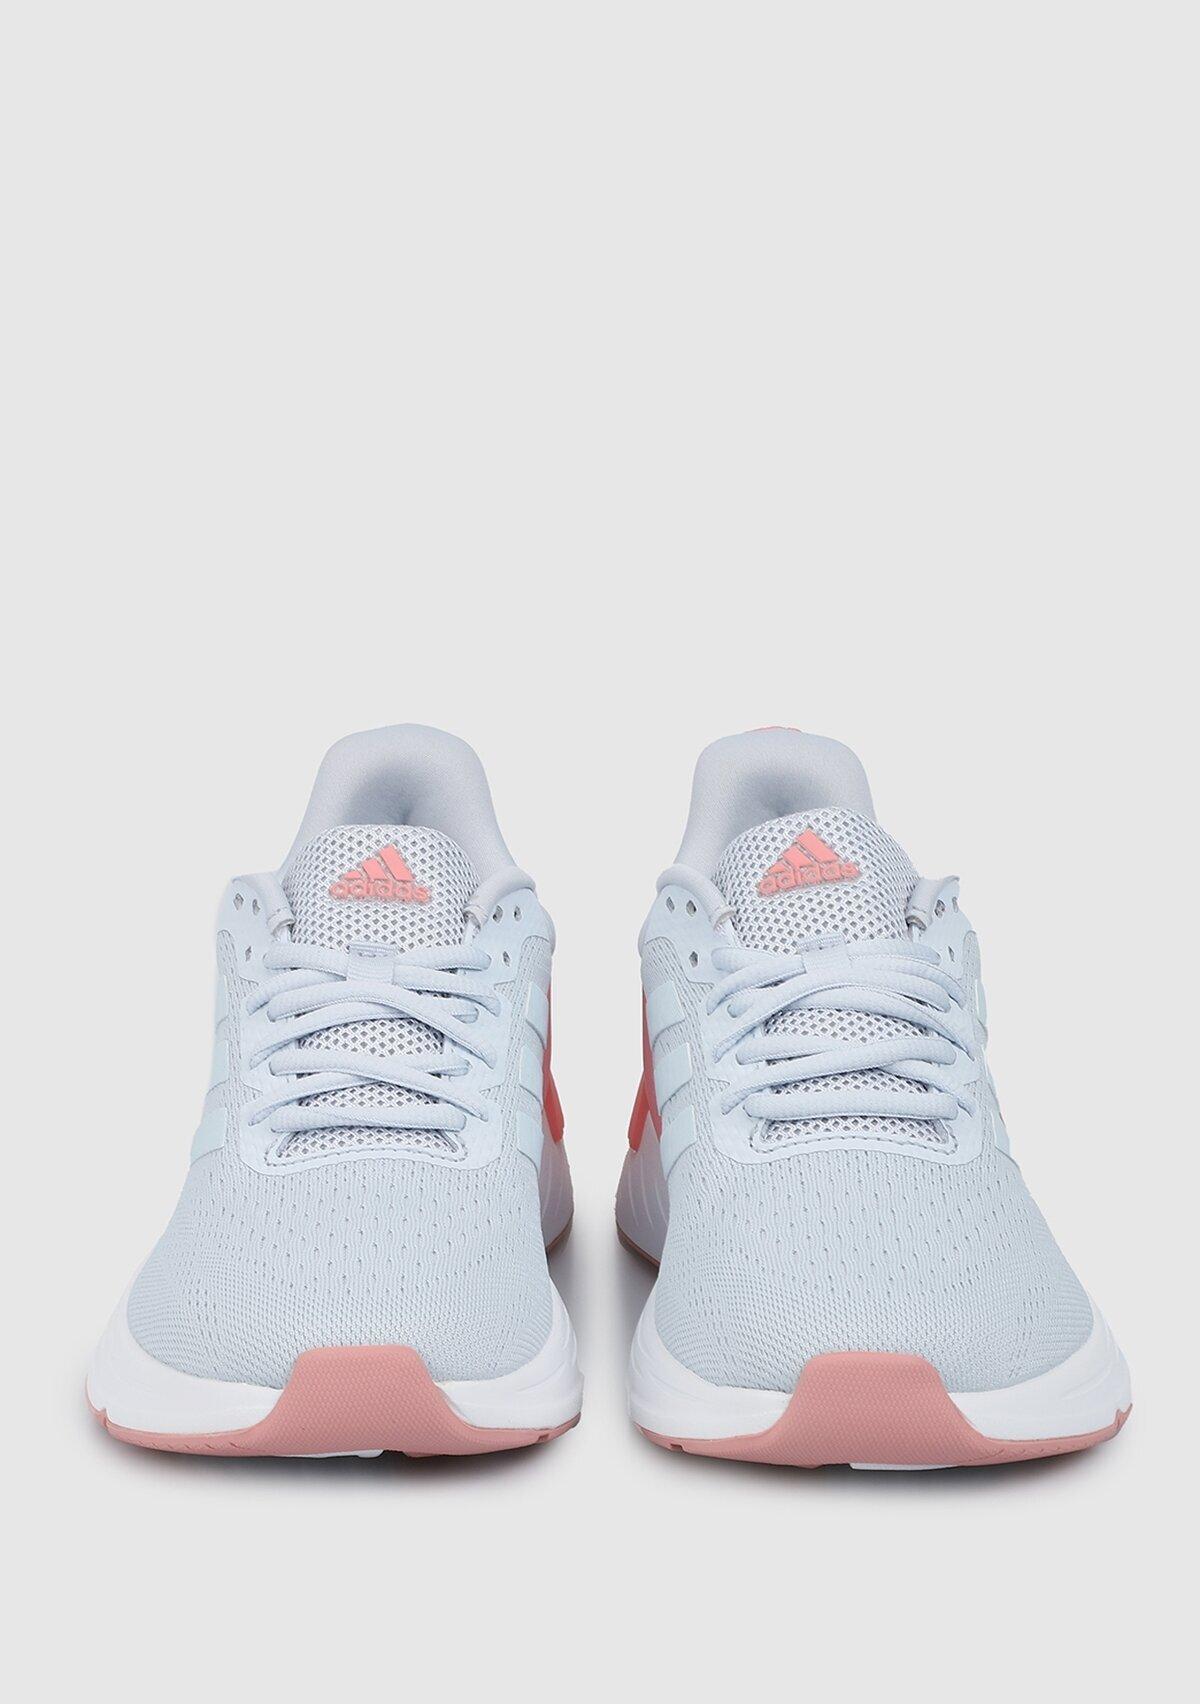 resm Response Super 2.0 Gri Çocuk Koşu Ayakkabısı H0170